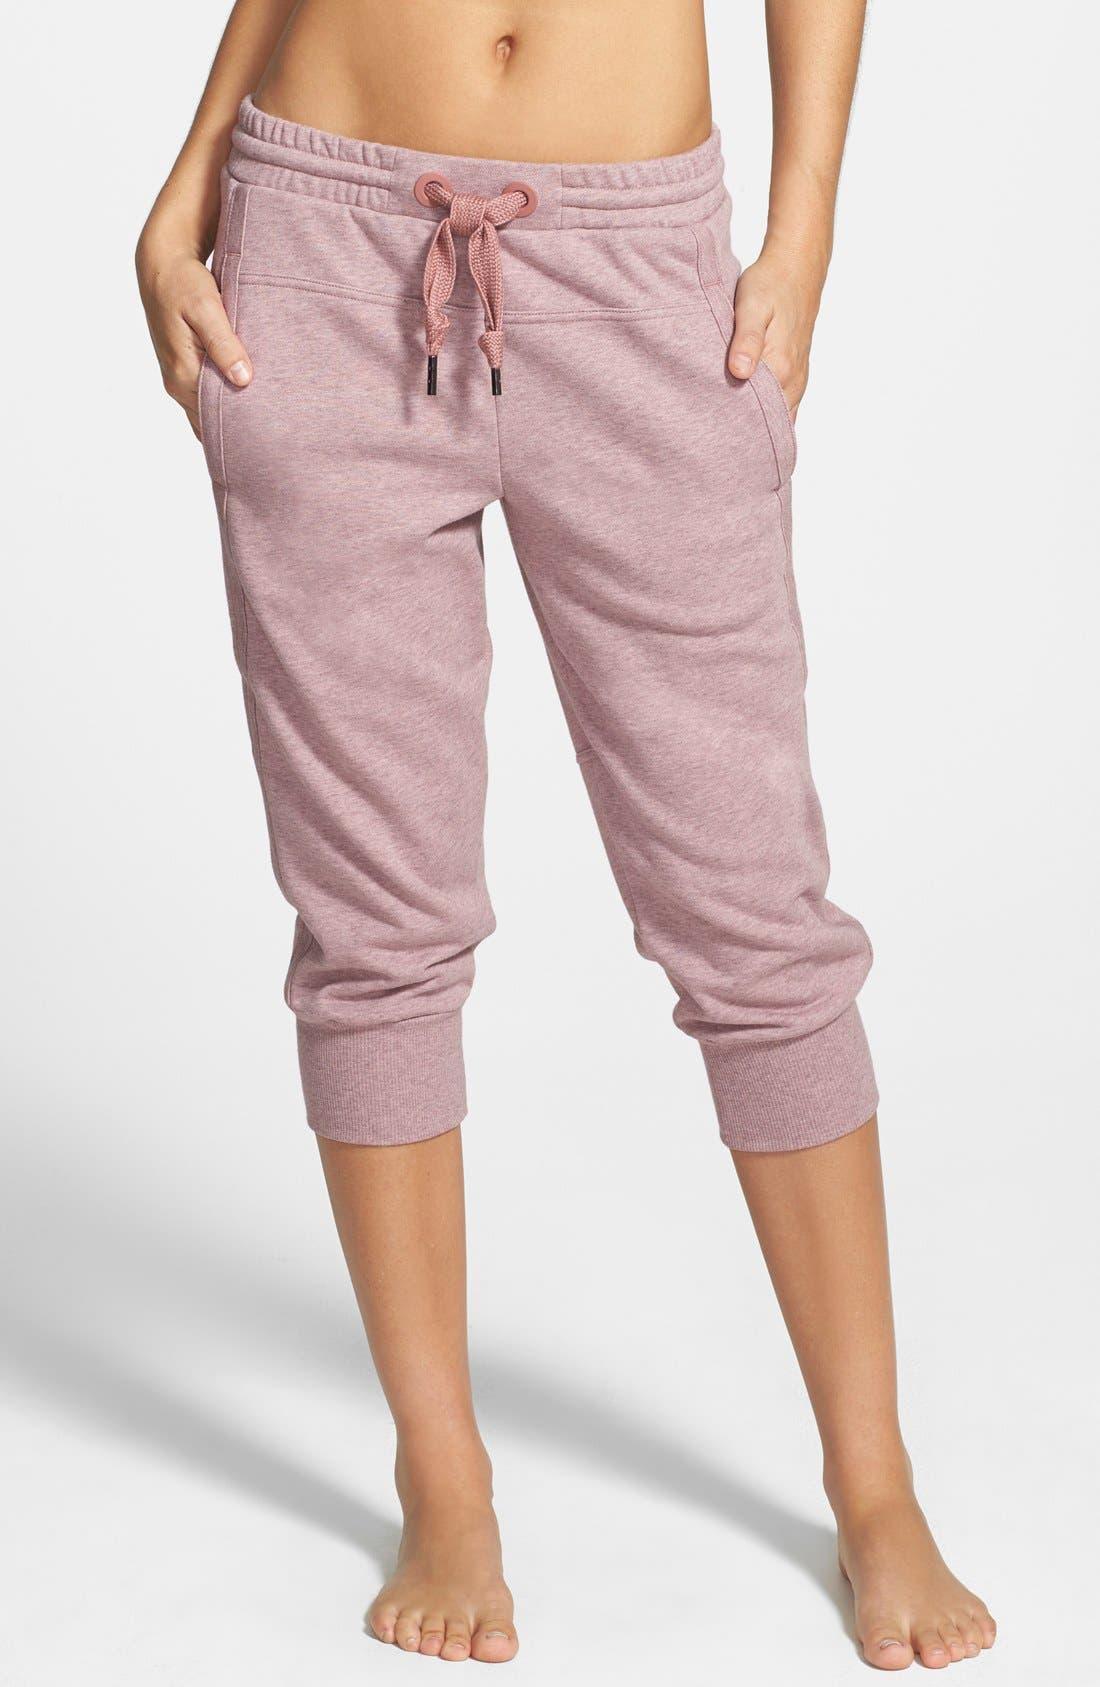 Main Image - adidas by Stella McCartney 'Essentials' Capris Sweatpants